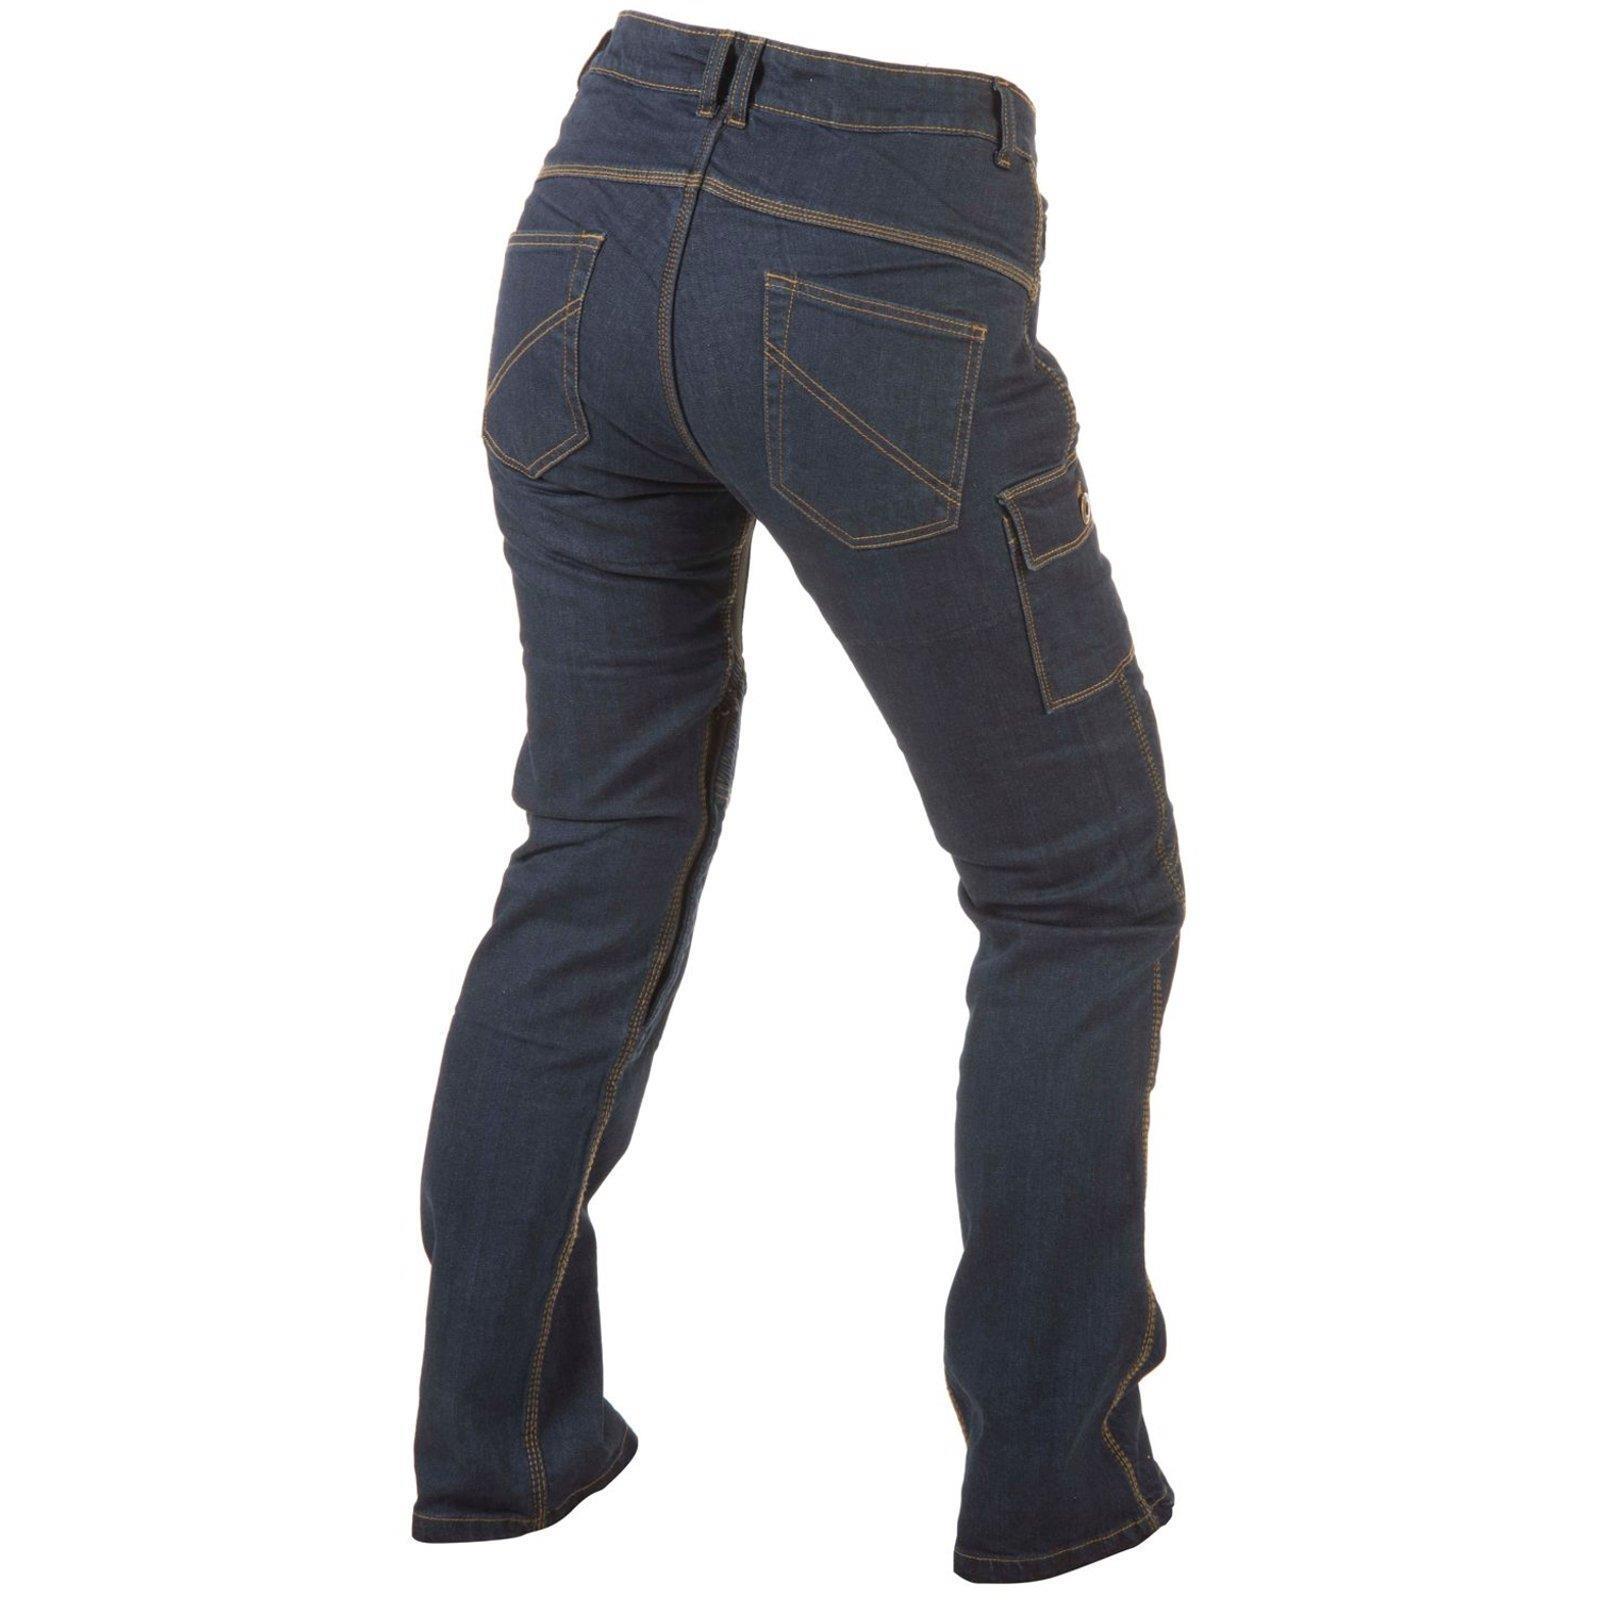 Trilobite-Pantaloni-Moto-Jeans-Abbigliamento-Parado-MICAS-URBAN-DUAL-PANTS-ACID miniatura 102